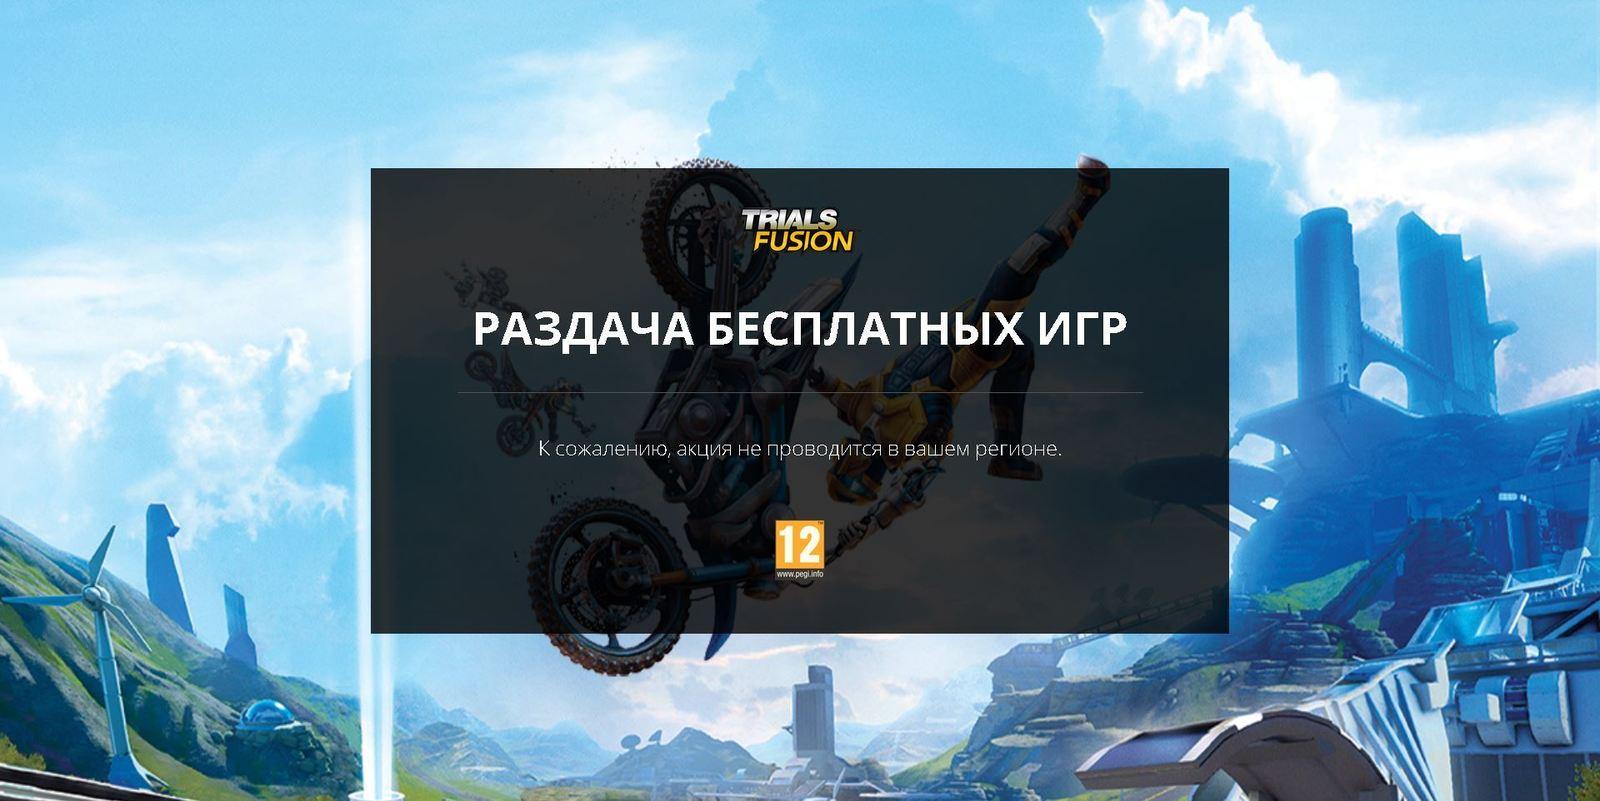 Прокси для Яндекс браузера  Lumpicsru